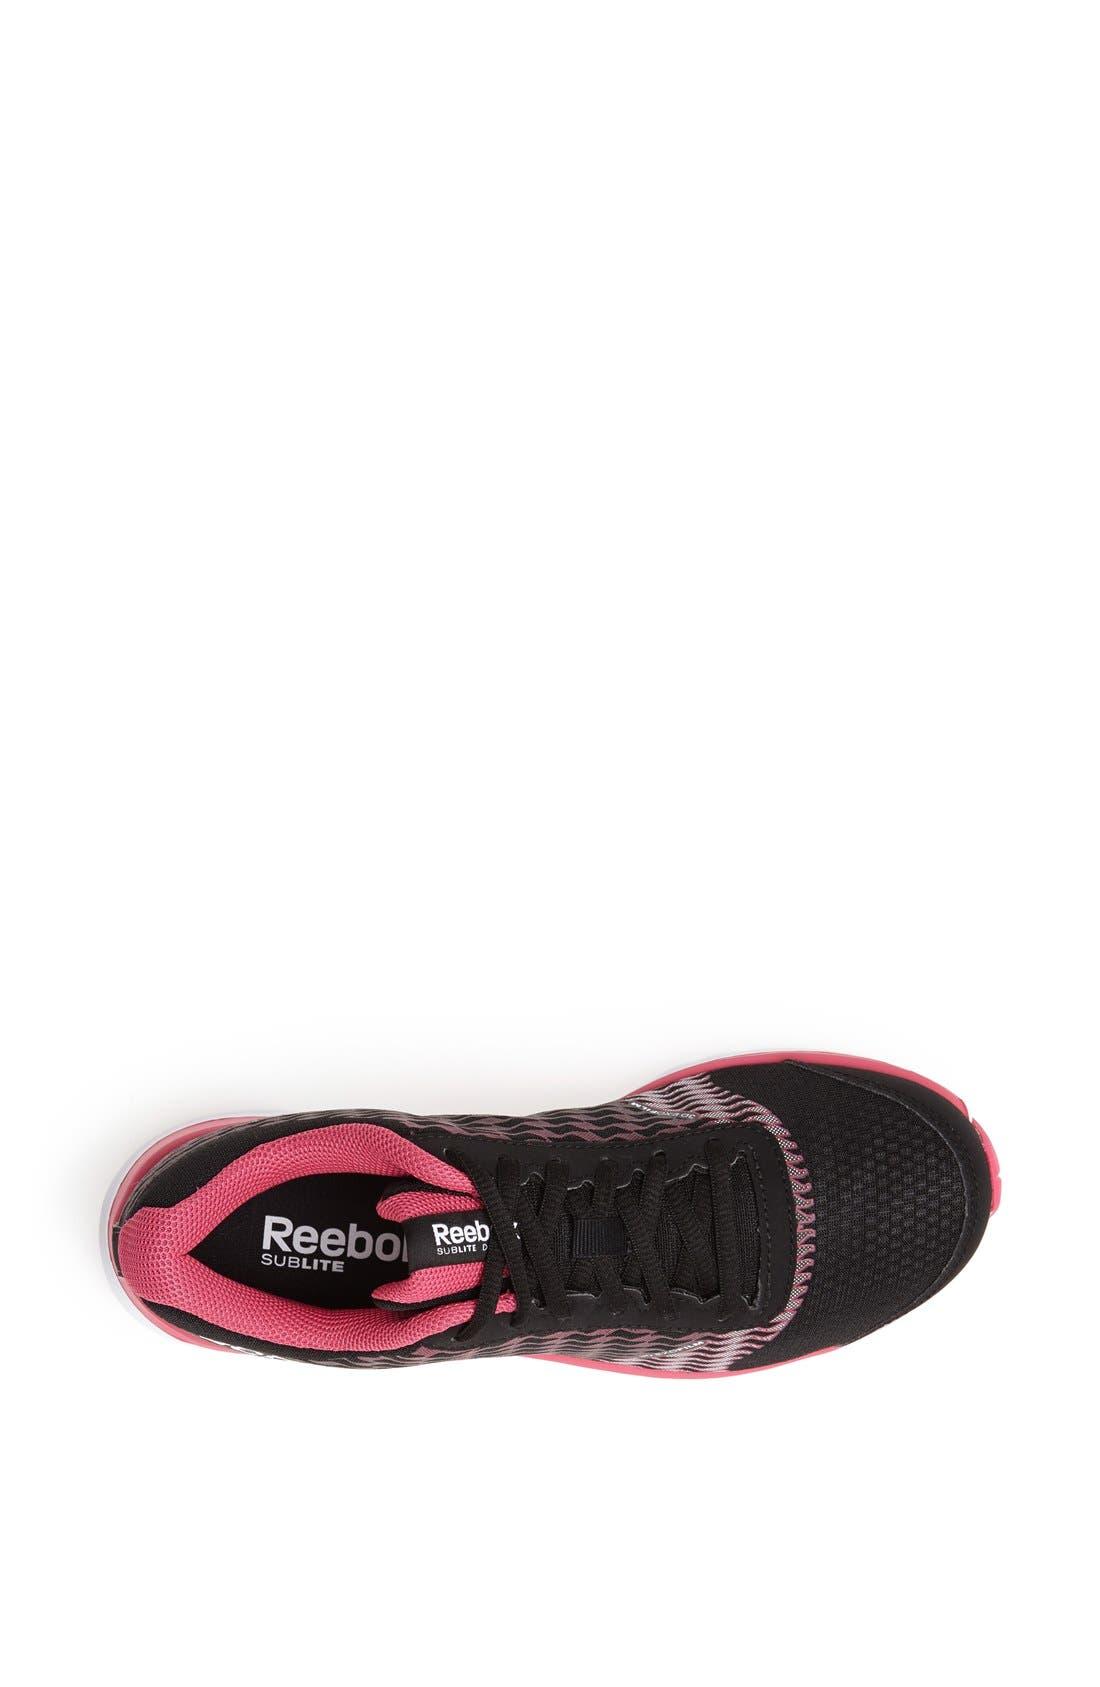 Alternate Image 3  - Reebok 'SubLite Duo Instinct' Running Shoe (Women)